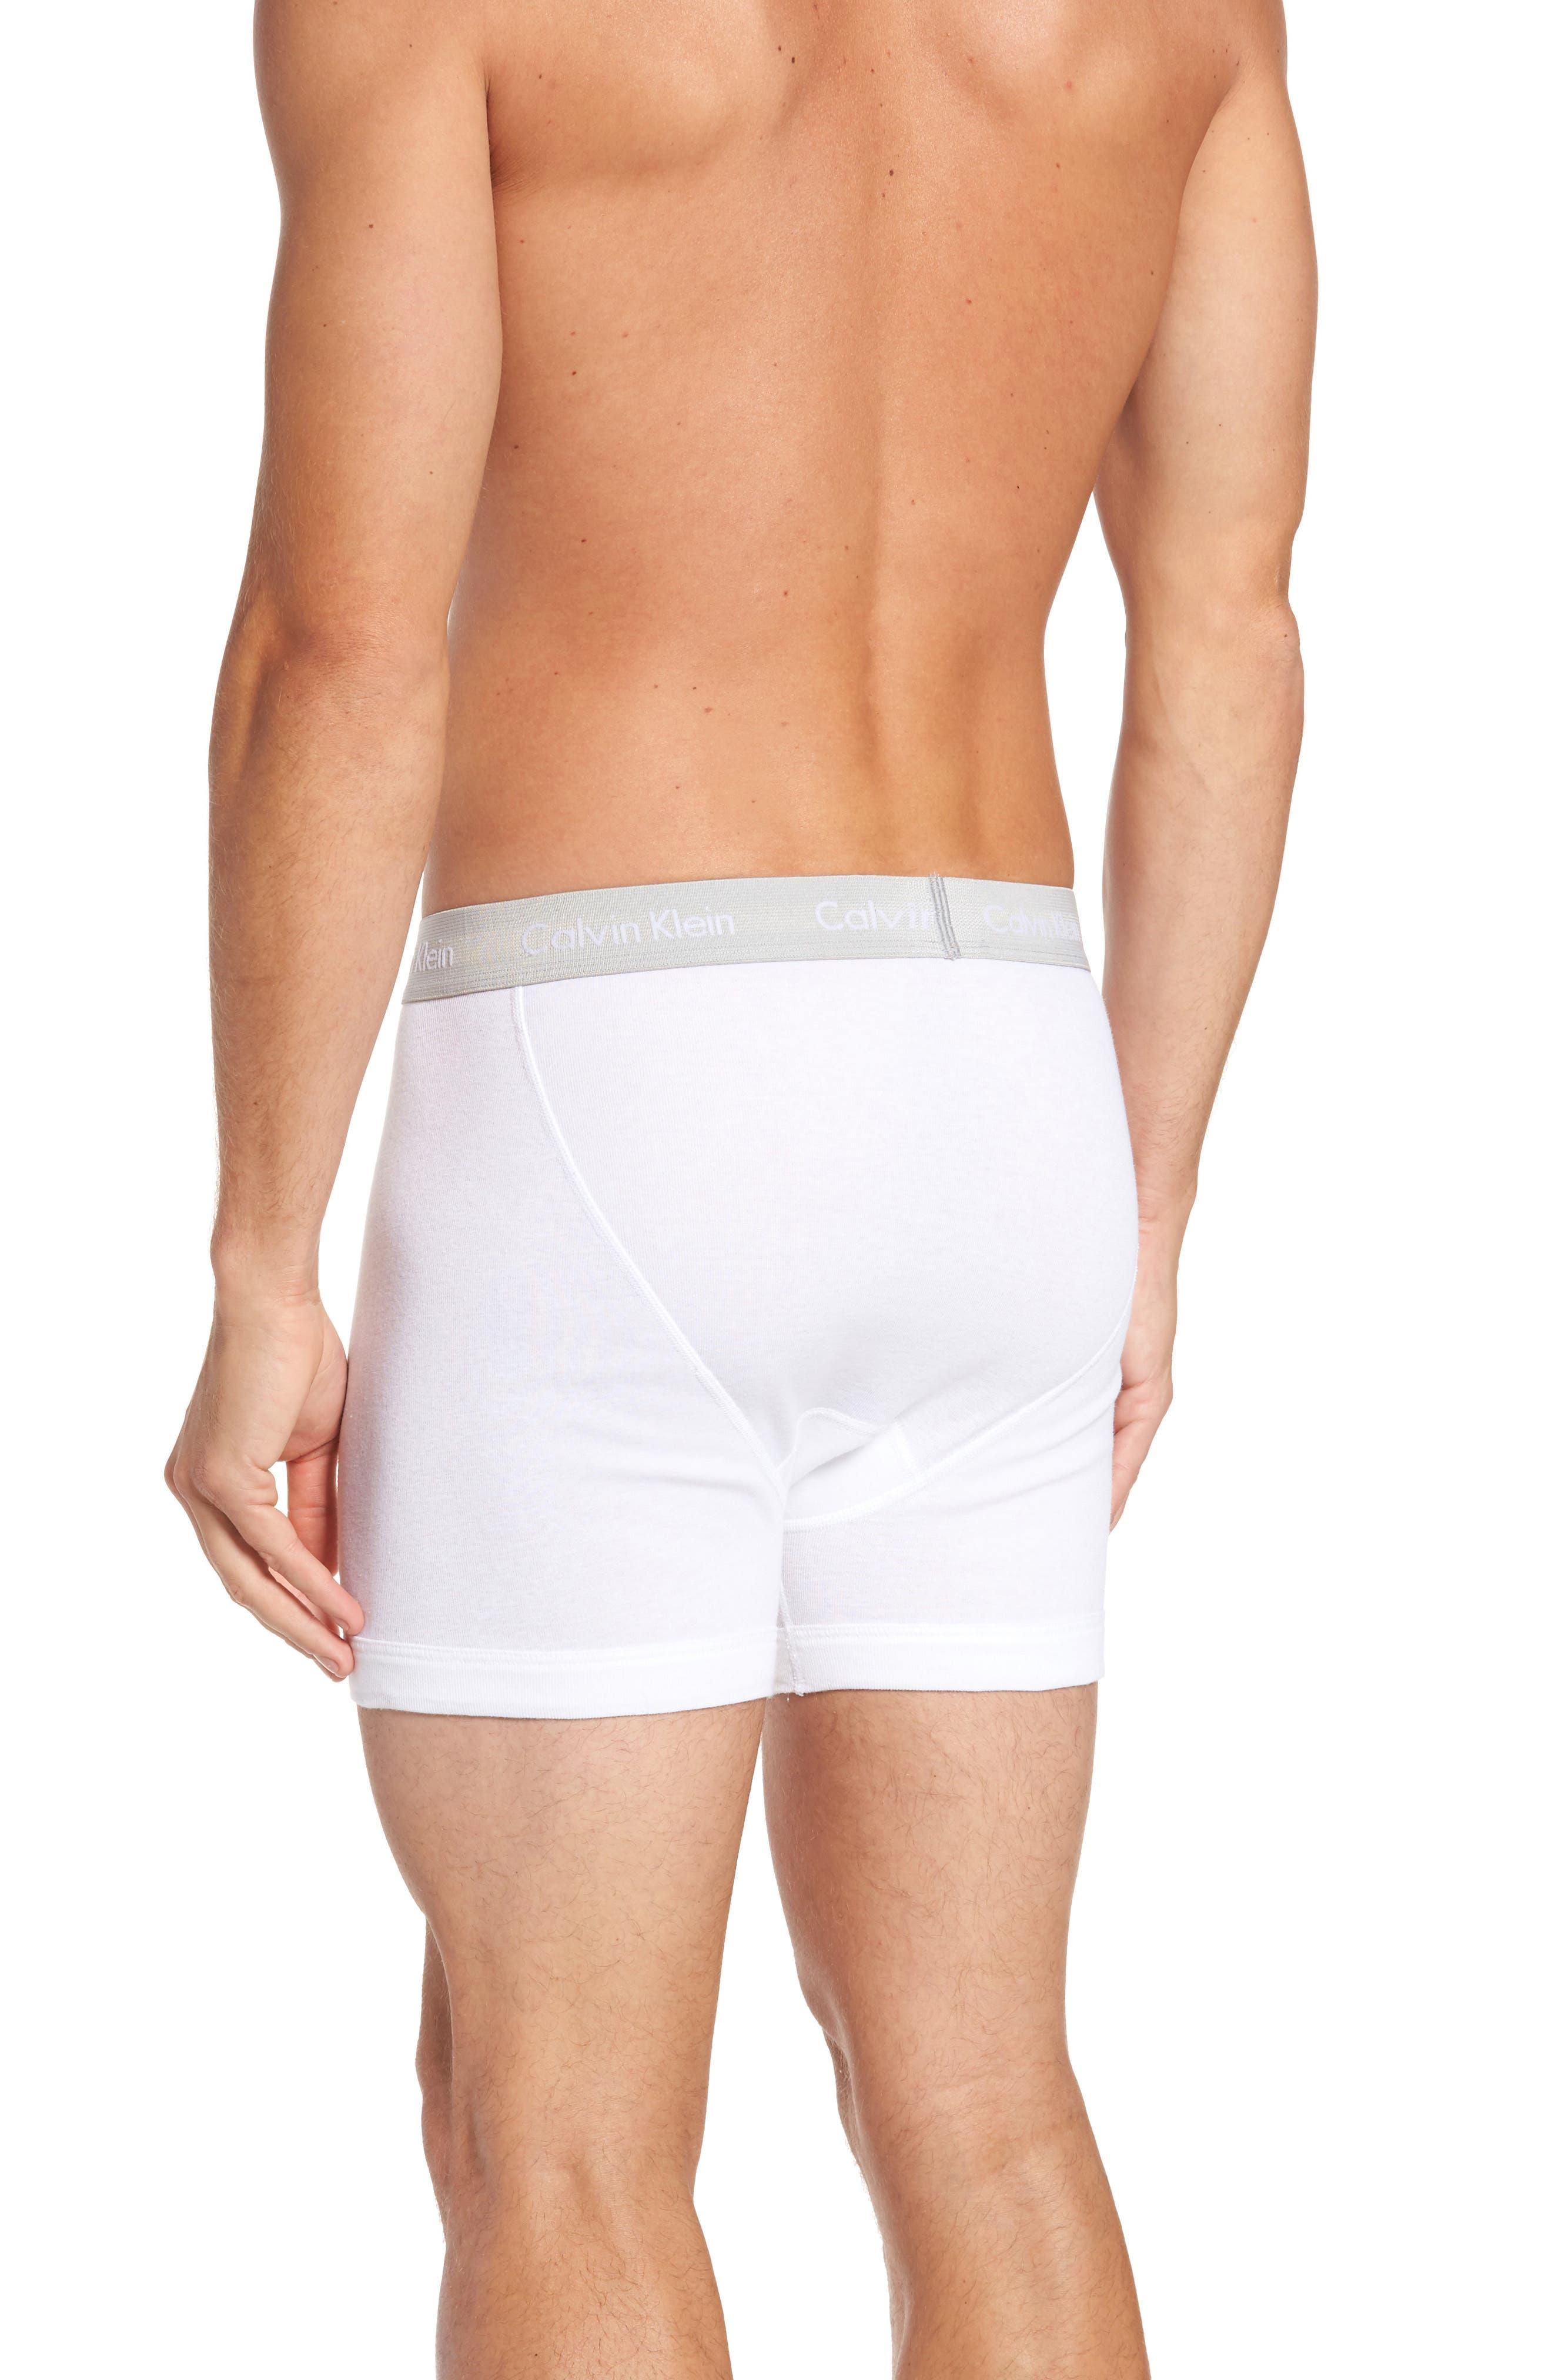 Alternate Image 3  - Calvin Klein Classic 4-Pack Cotton Boxer Briefs